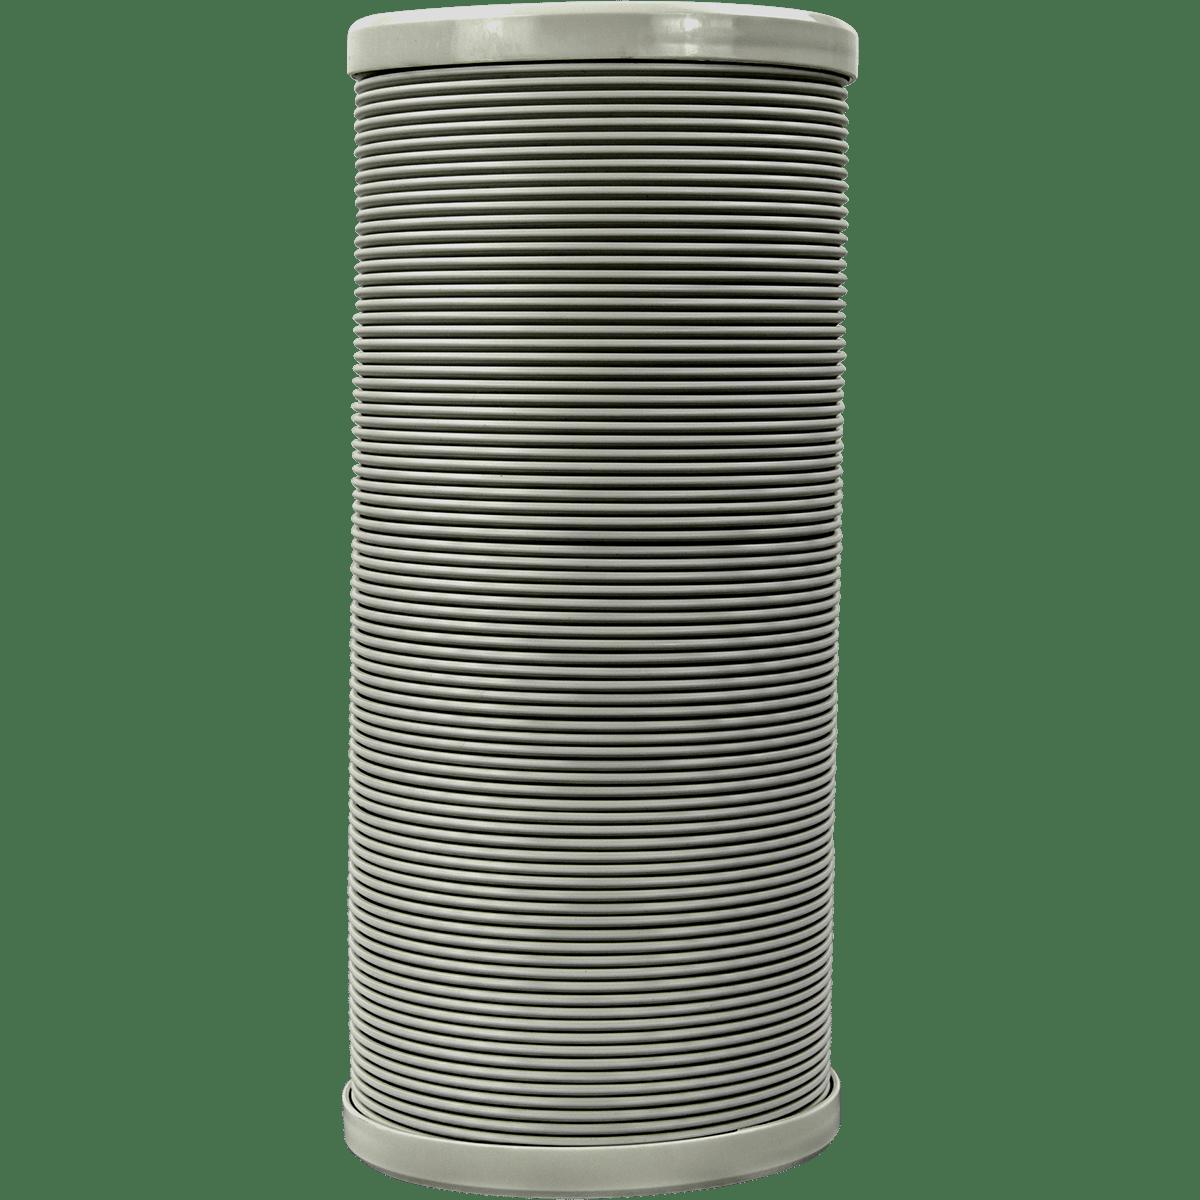 Honeywell MOCES Series Portable AC Hose ho7915